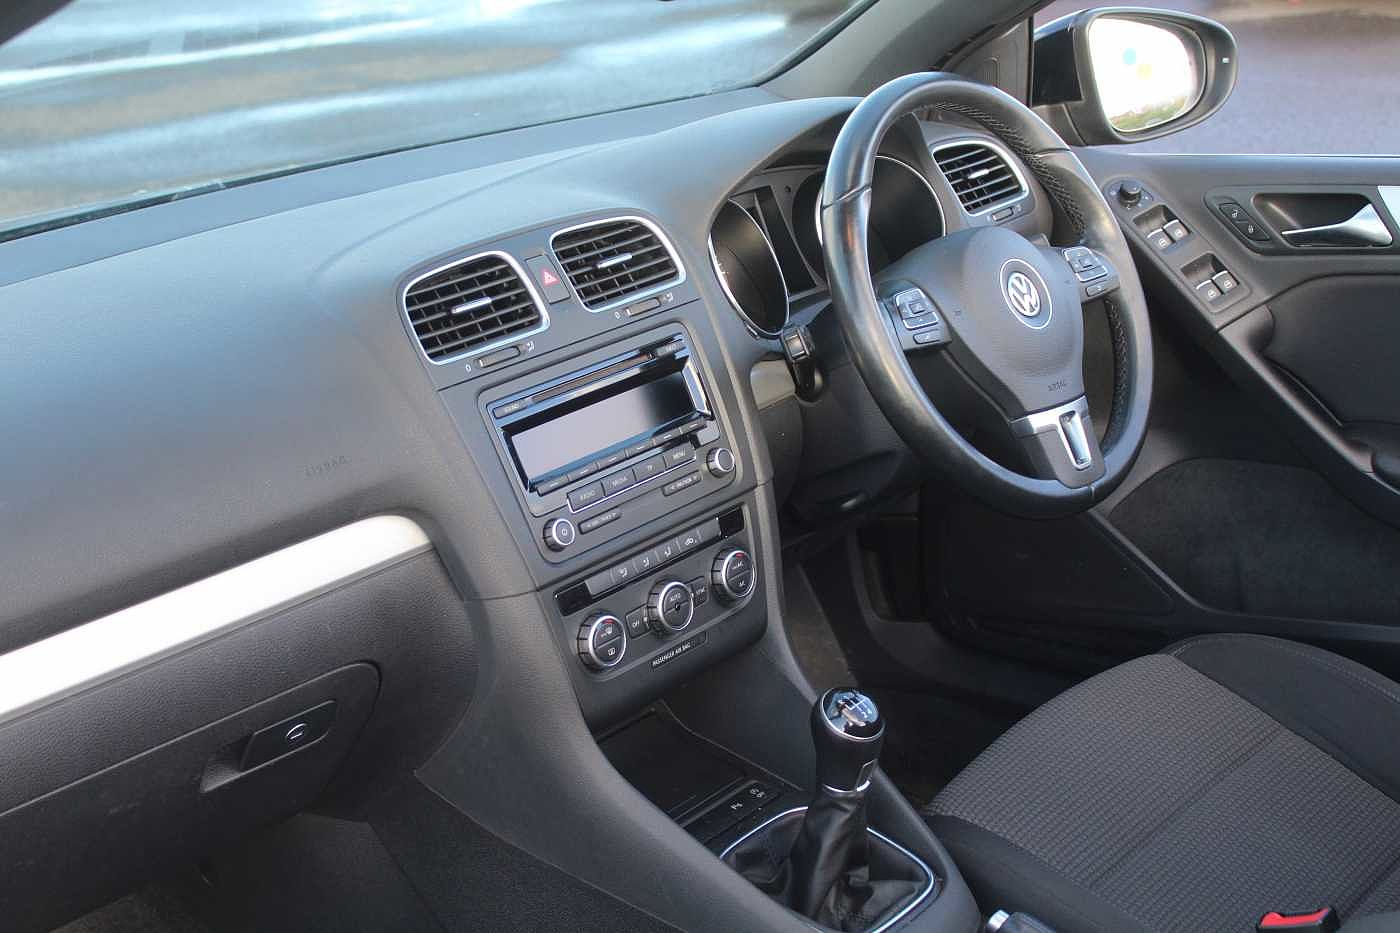 Volkswagen Golf 1.6 TDI SE Bluemotion (105 PS) Cabriolet